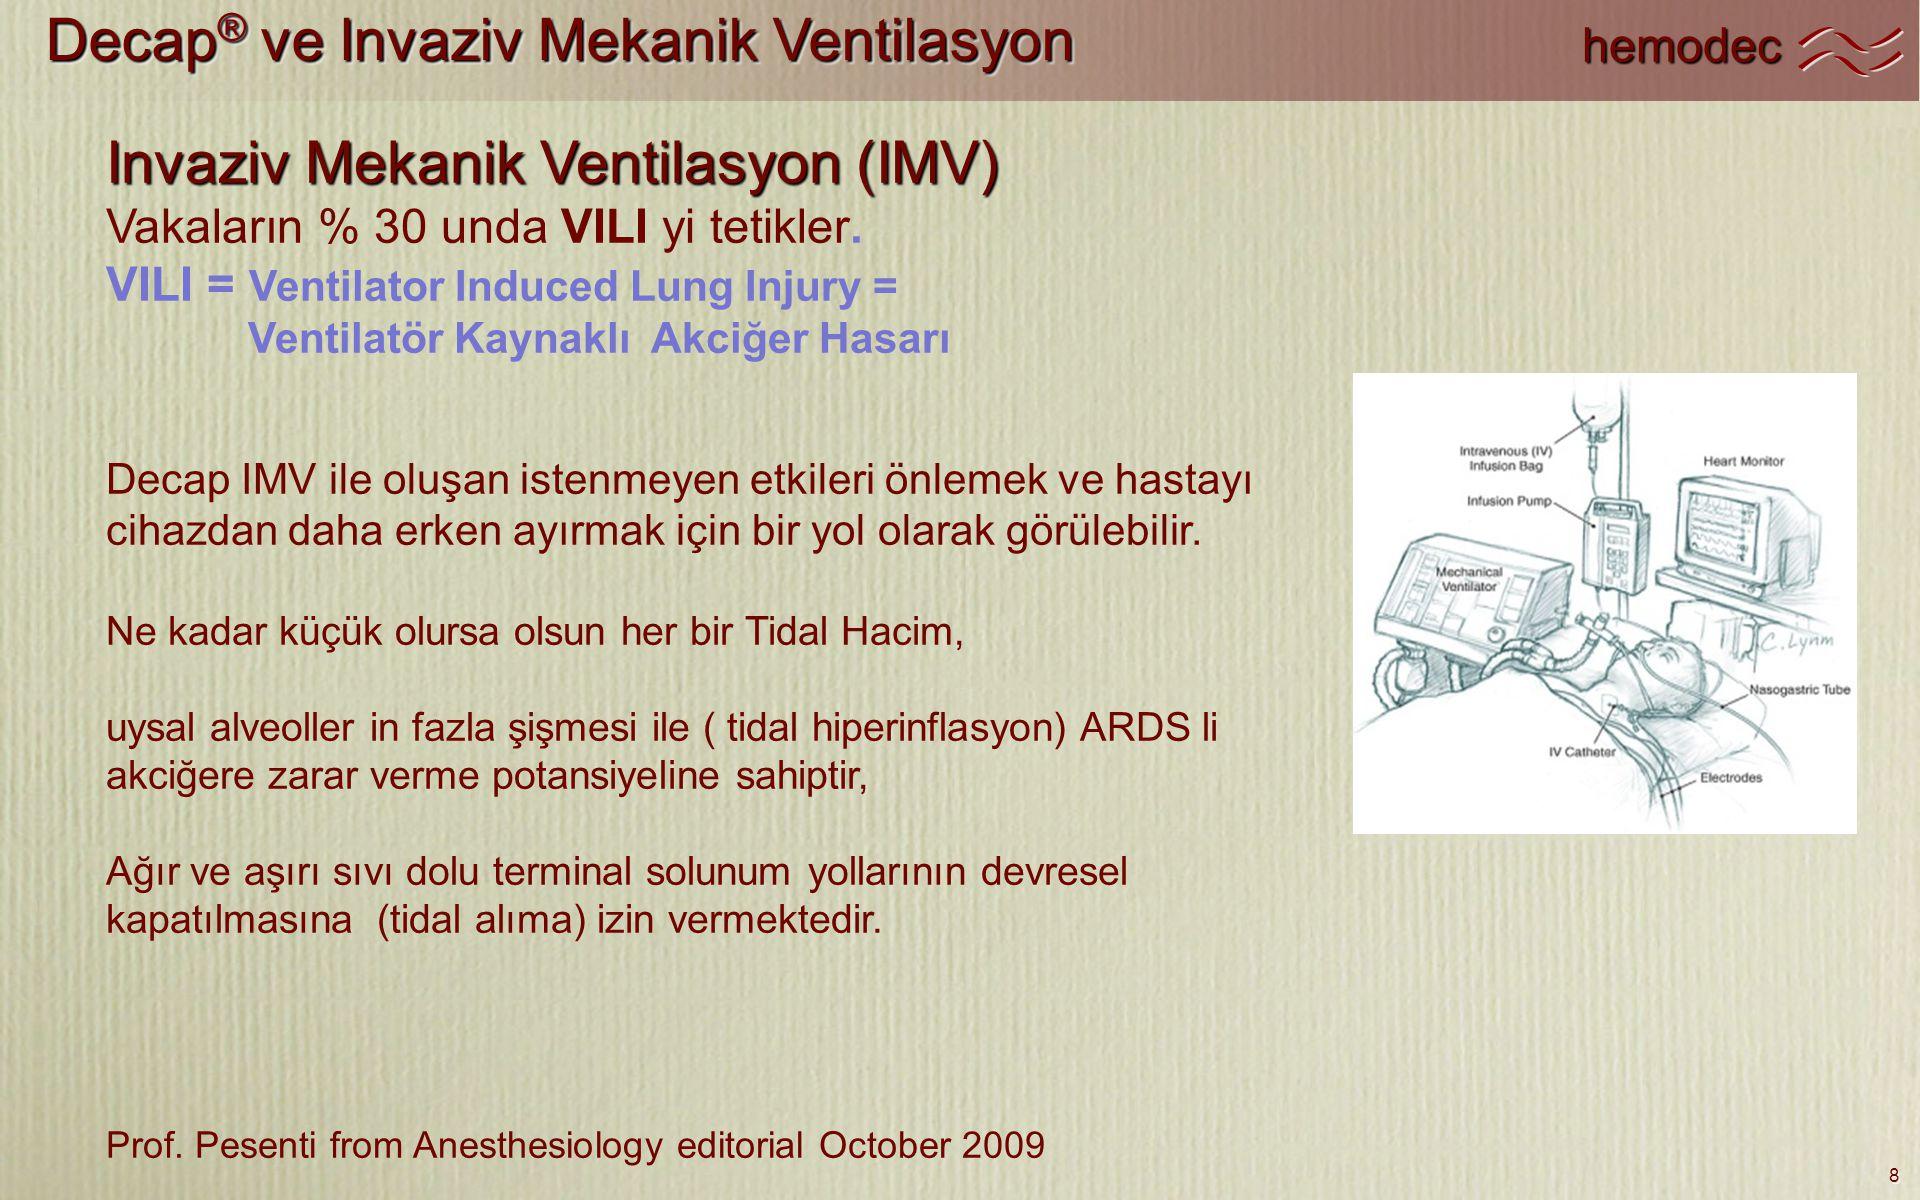 Decap® ve Invaziv Mekanik Ventilasyon